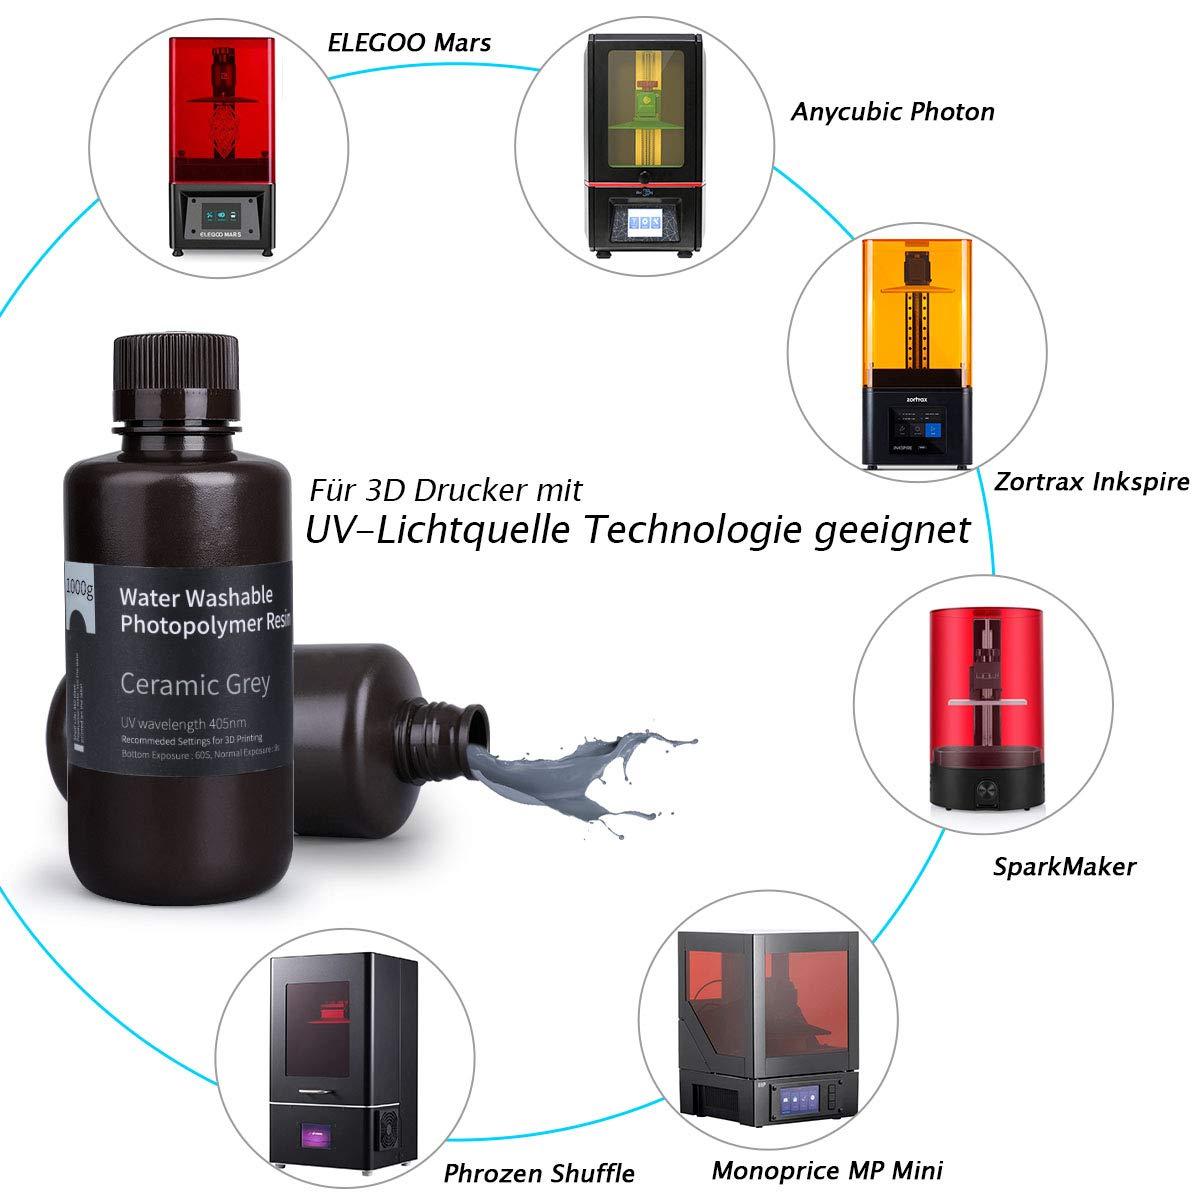 ELEGOO - Resina rápida lavable con agua, para impresora 3D, LCD ...